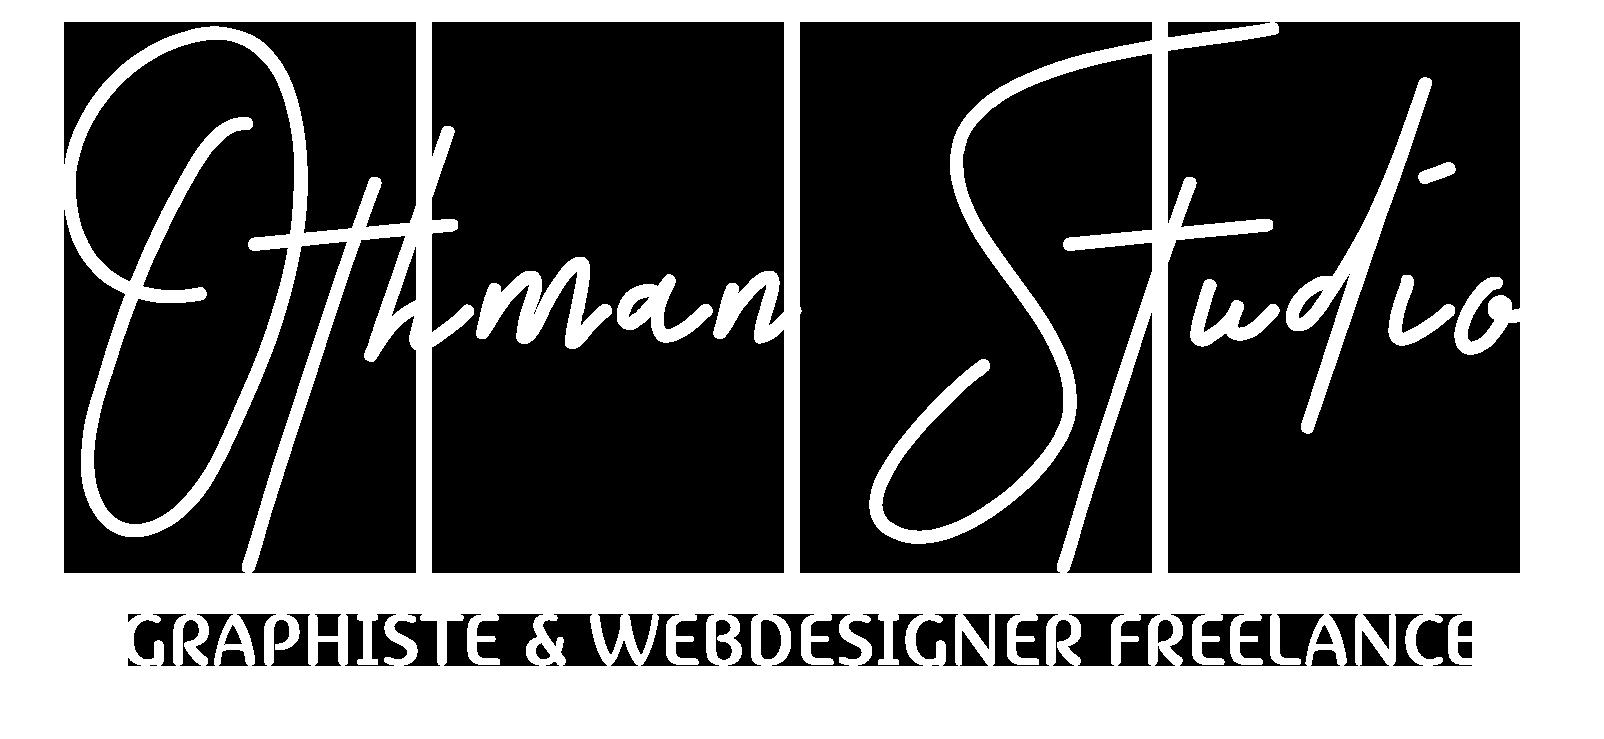 othman studio Accueil graphiste freelance